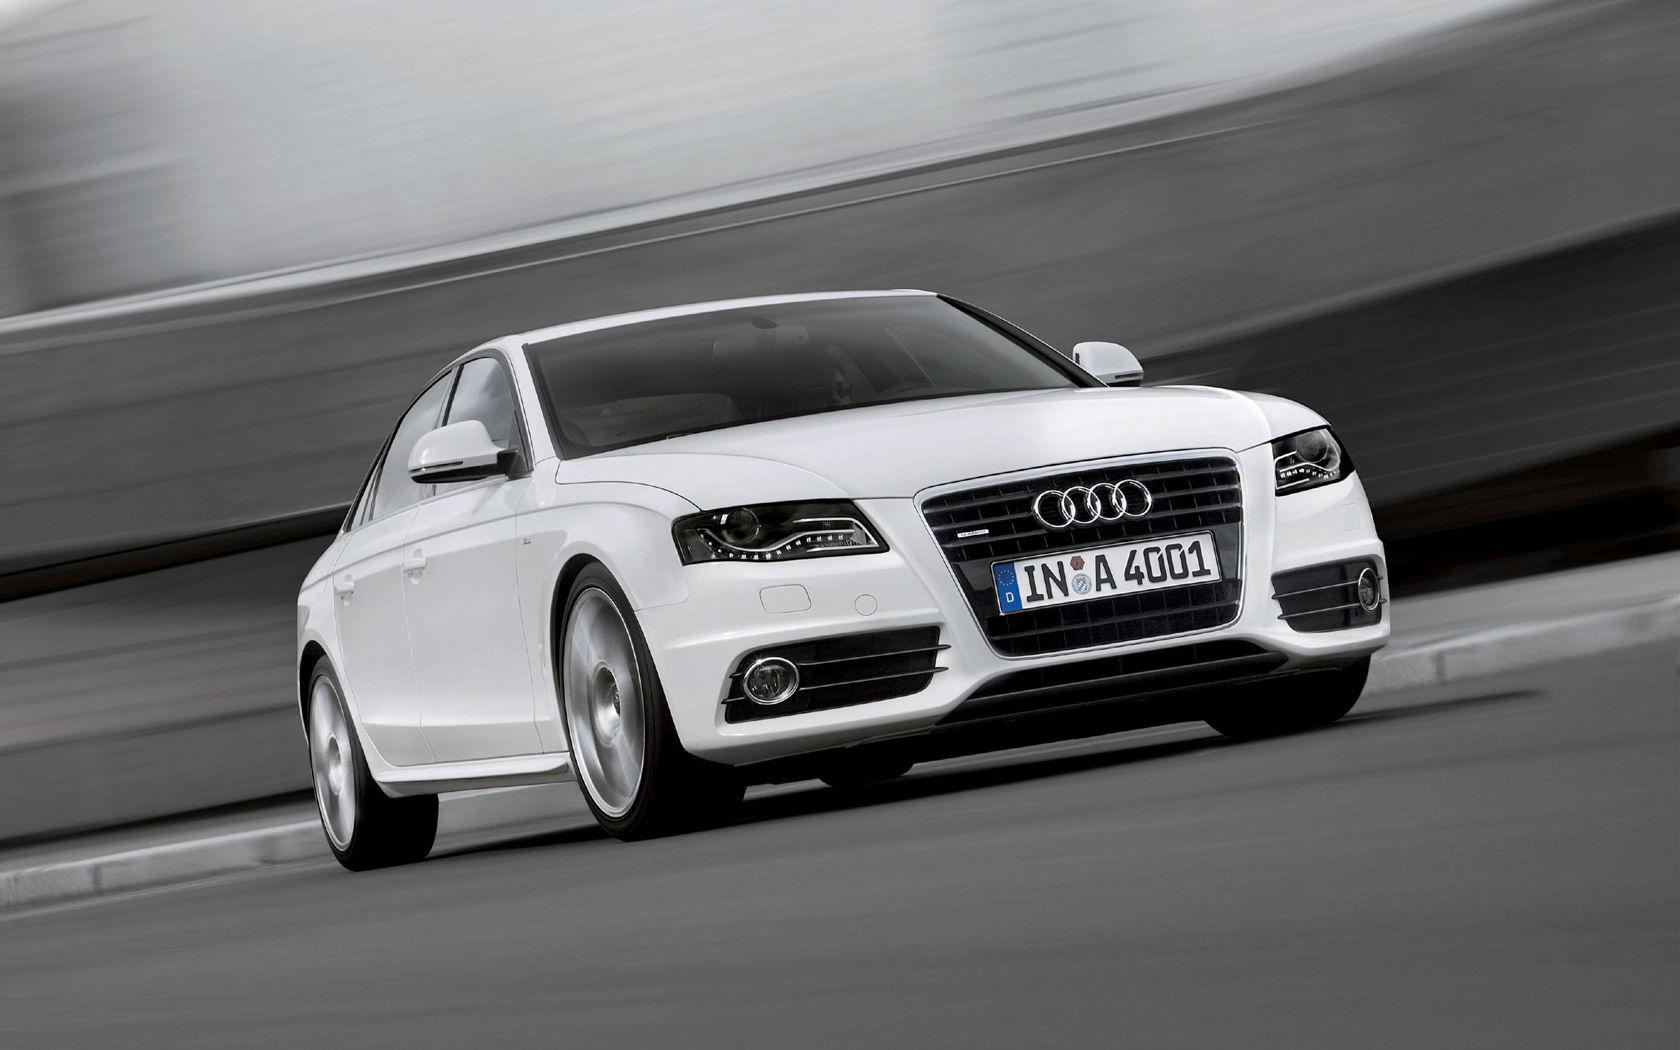 Audi A4 20t 32 S4 Quattro Avant Free Widescreen